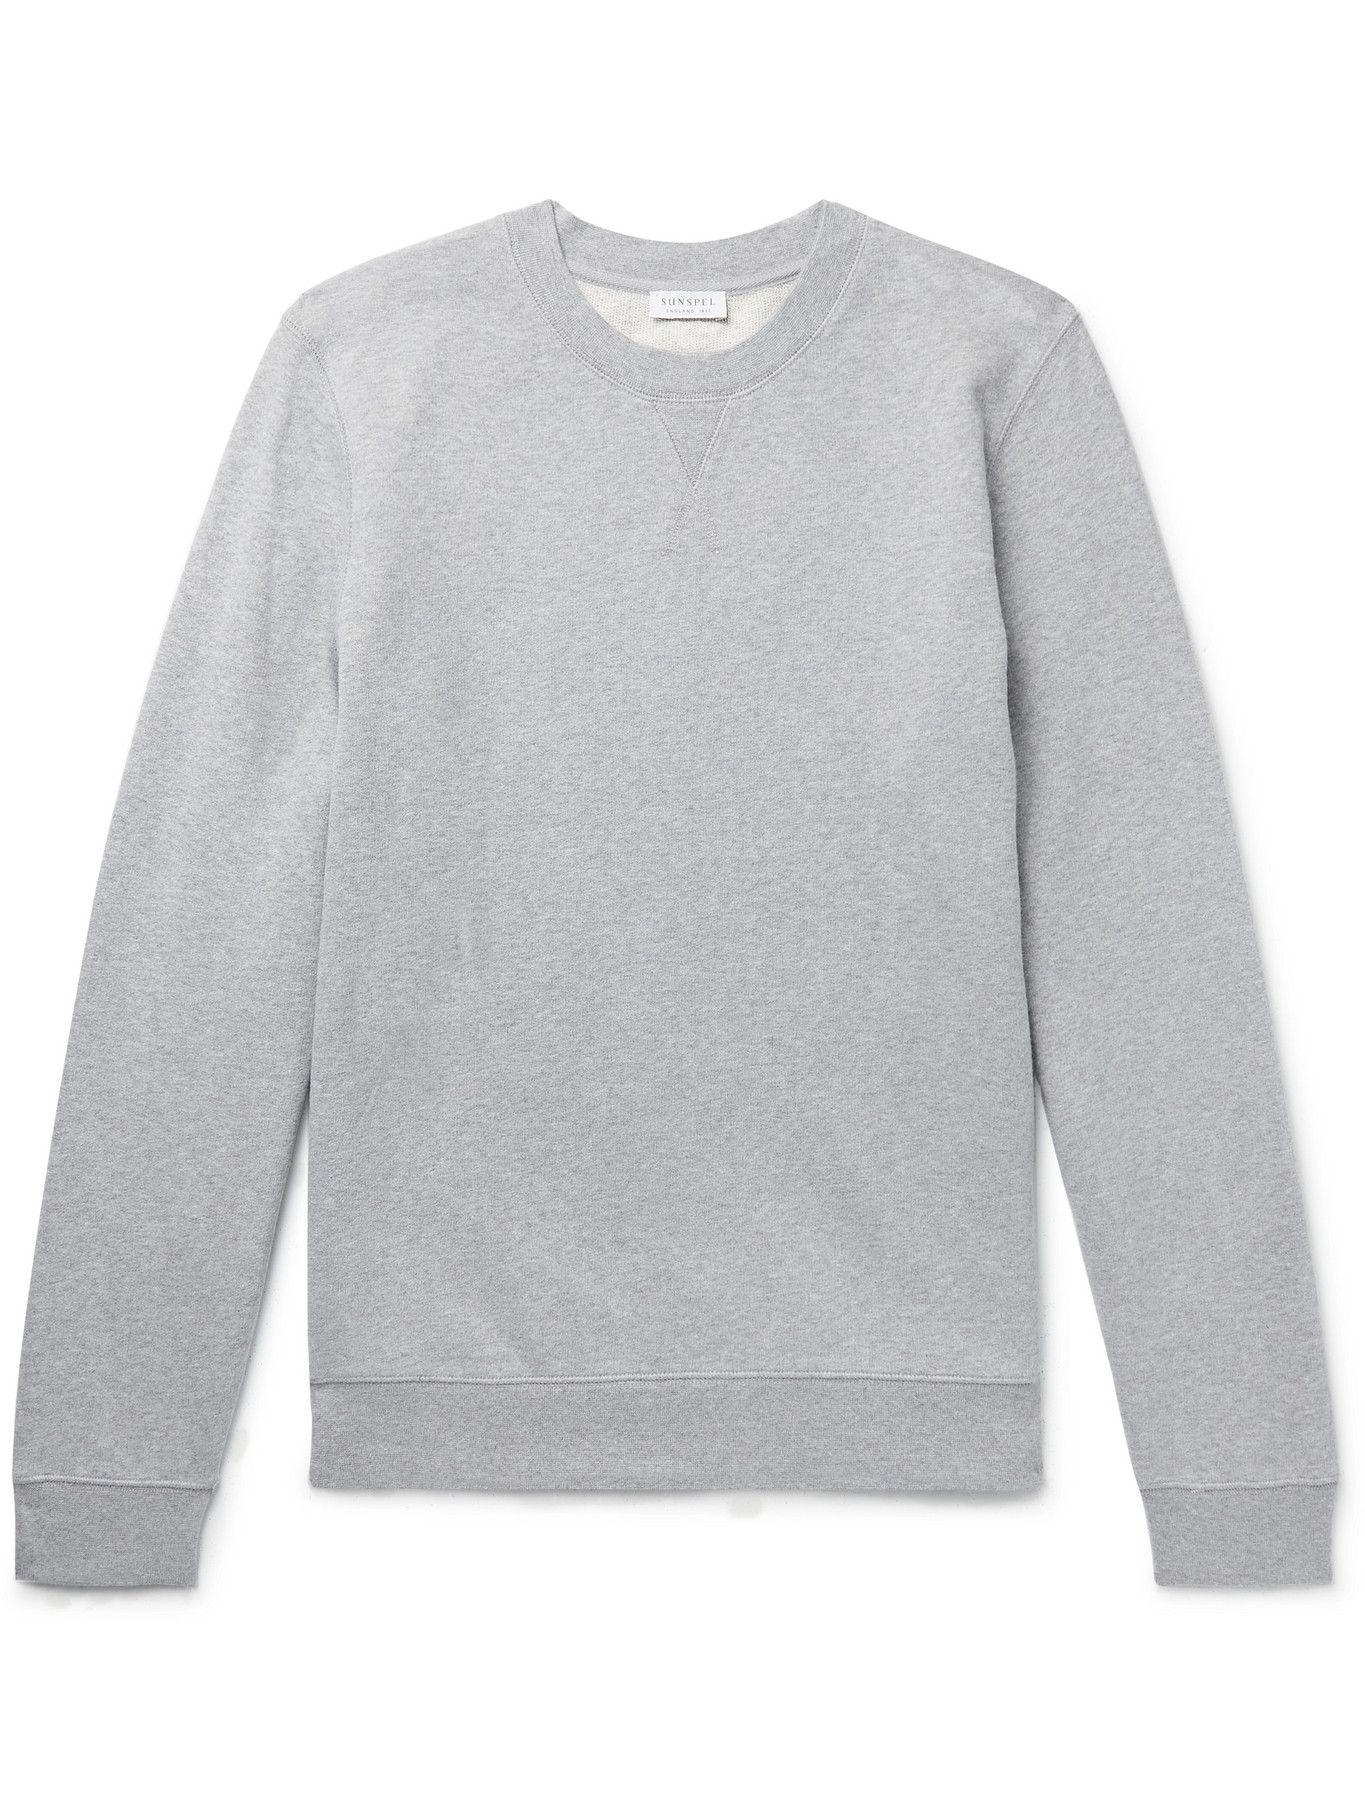 Photo: Sunspel - Cotton-Jersey Sweatshirt - Gray